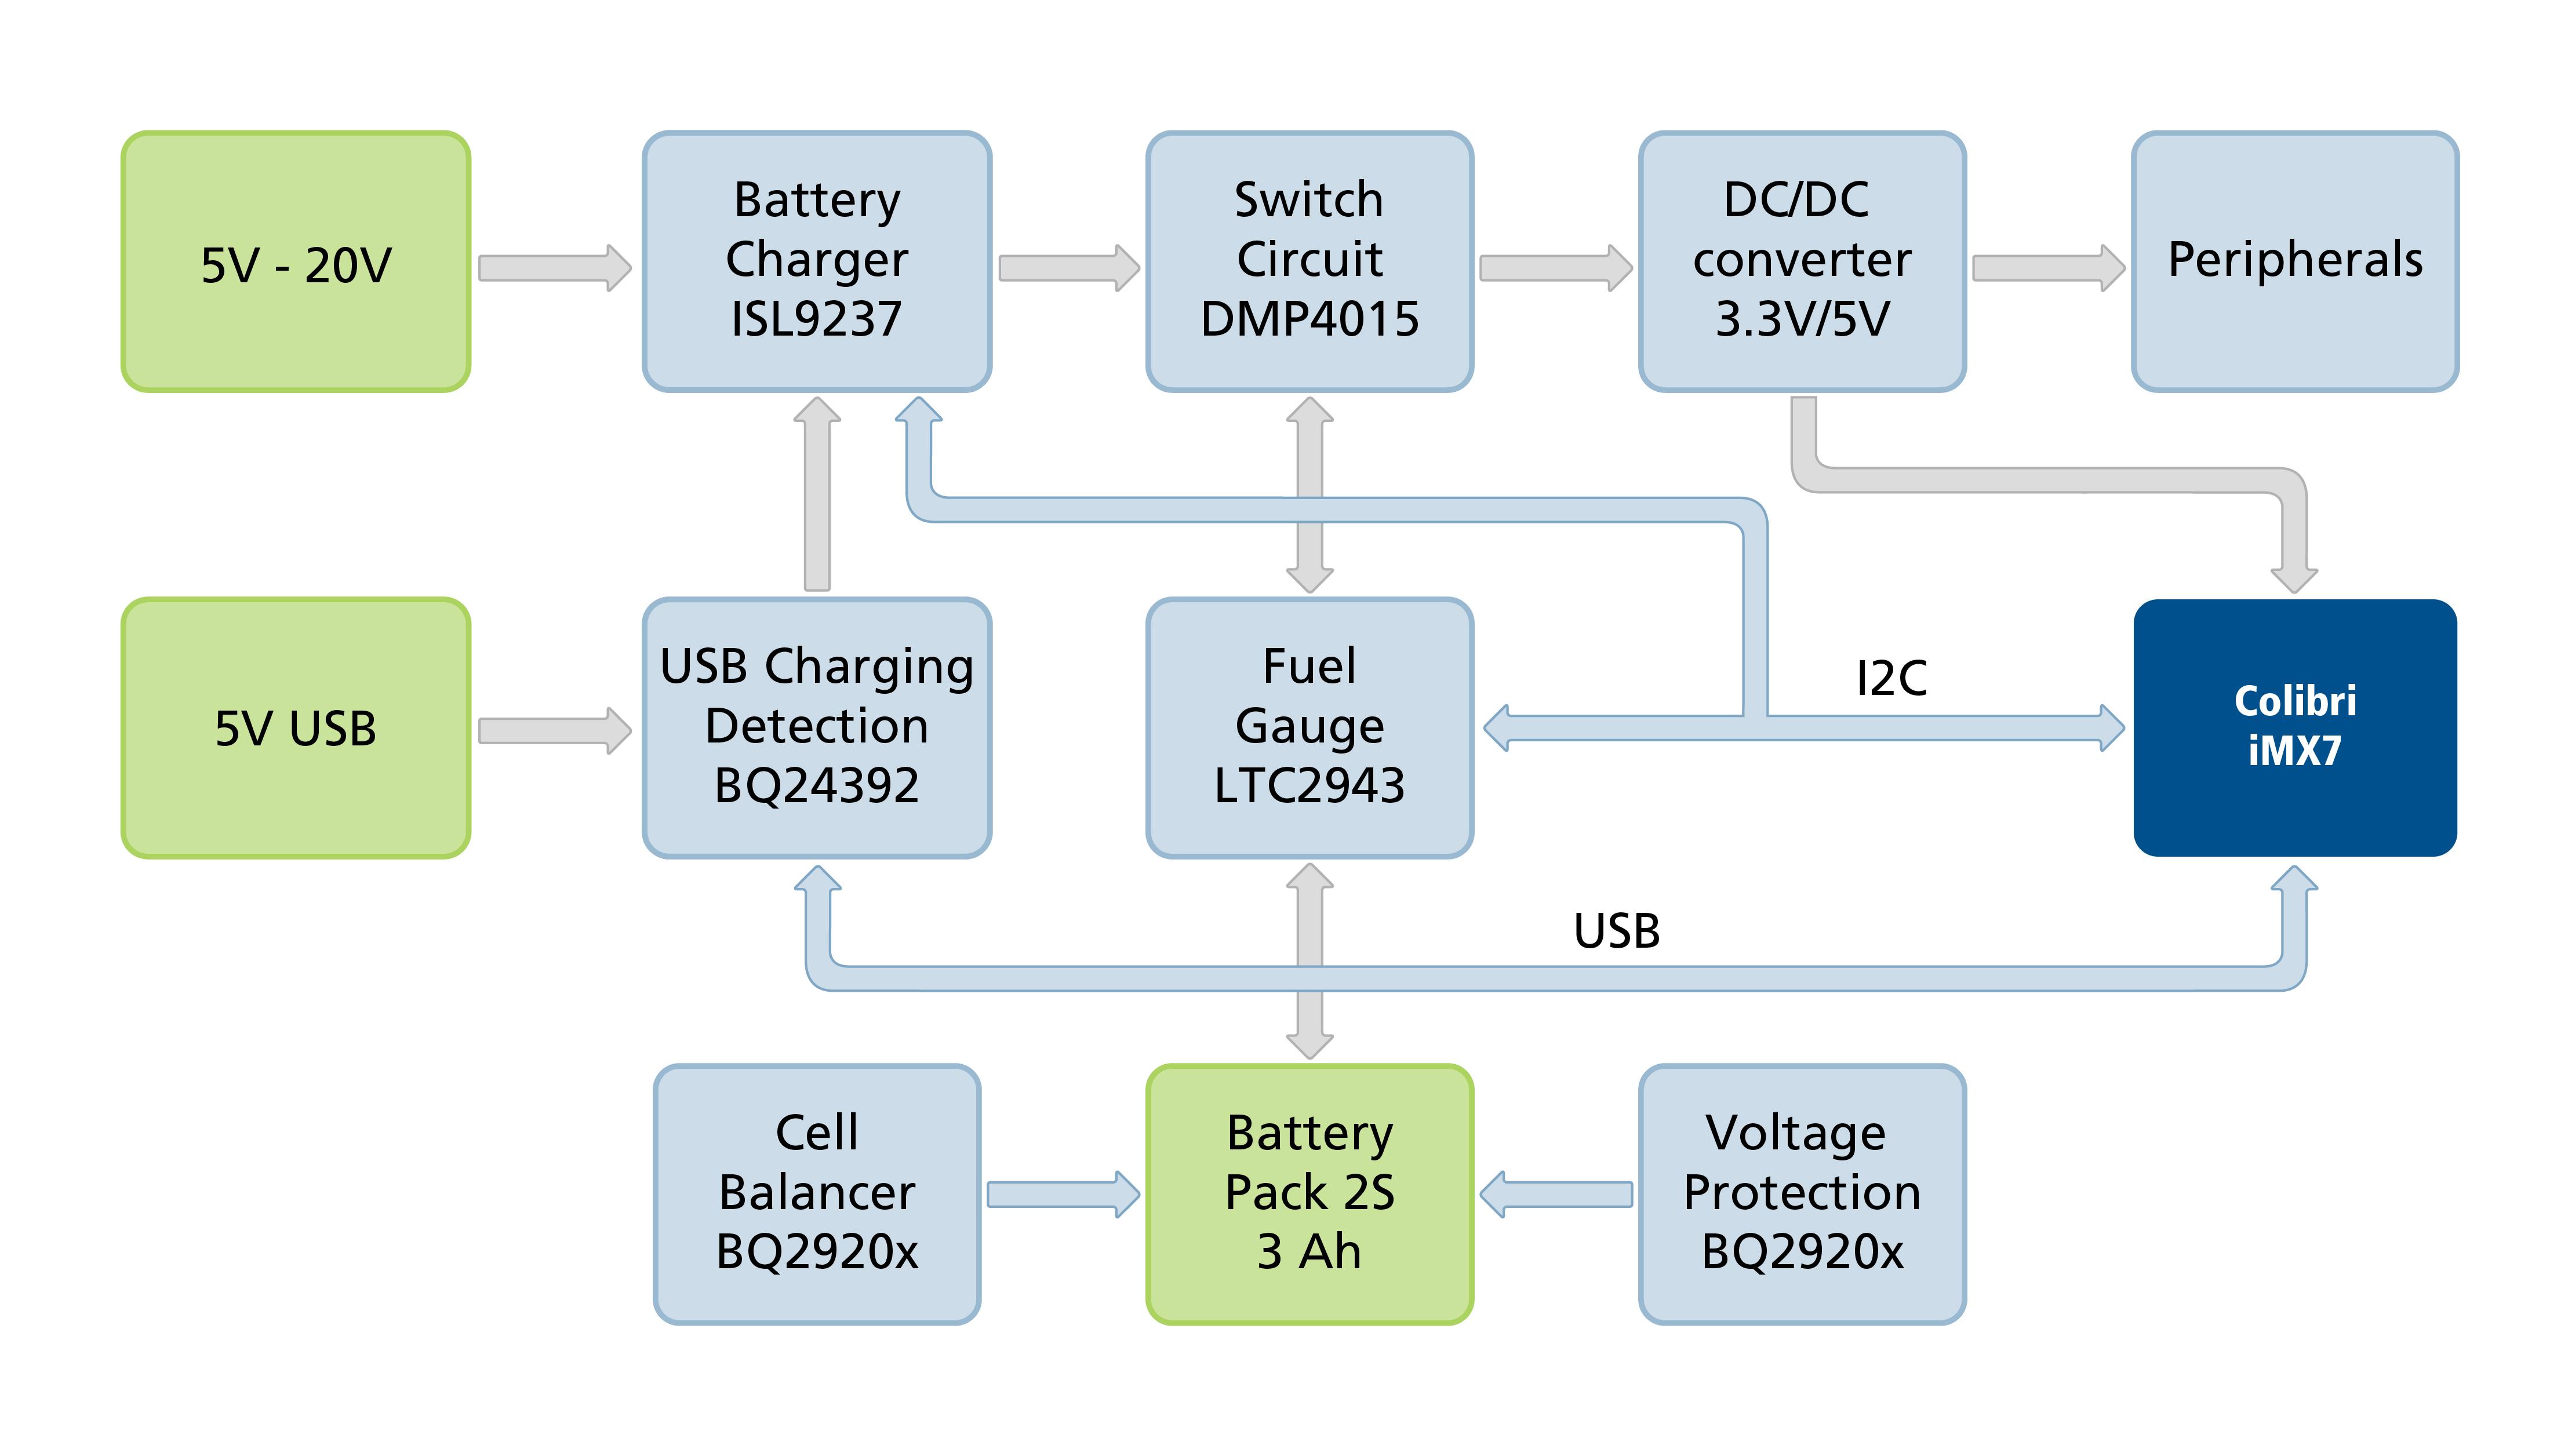 Toradex Colibri iMX7 Low Power Demo BMS Overview